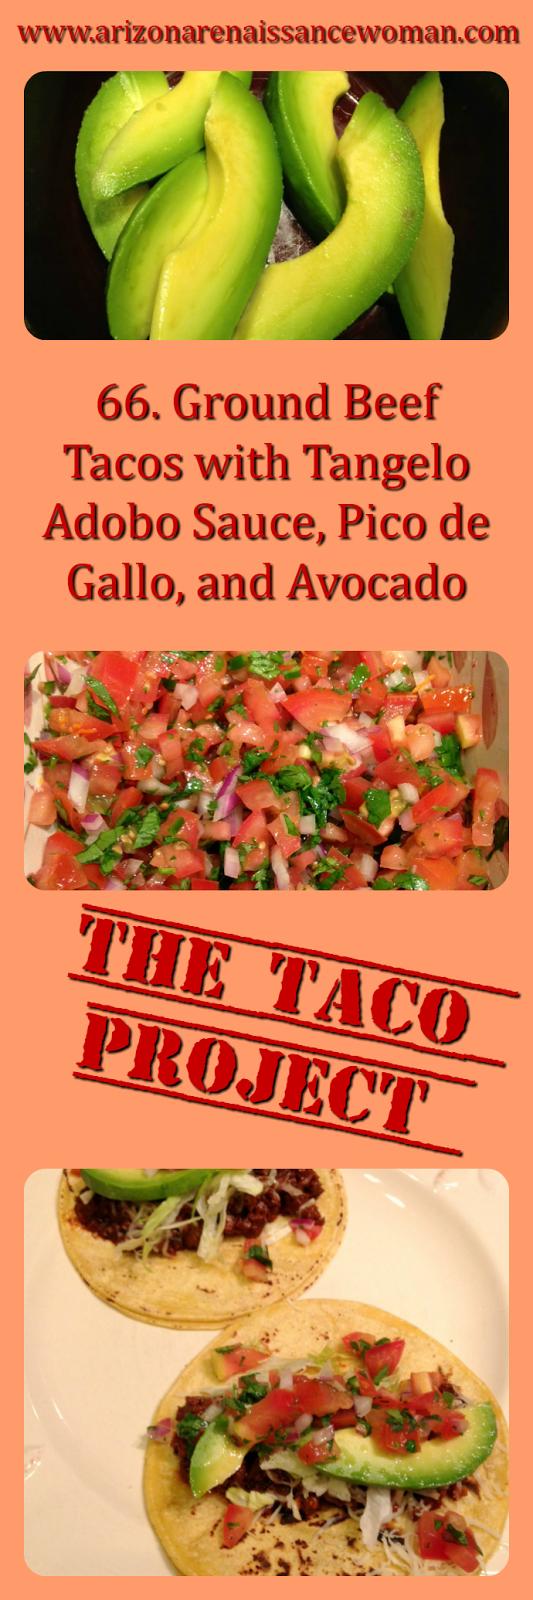 Ground Beef Tacos with Tangelo Adobo Sauce, Pico de Gallo, and Avocado Collage